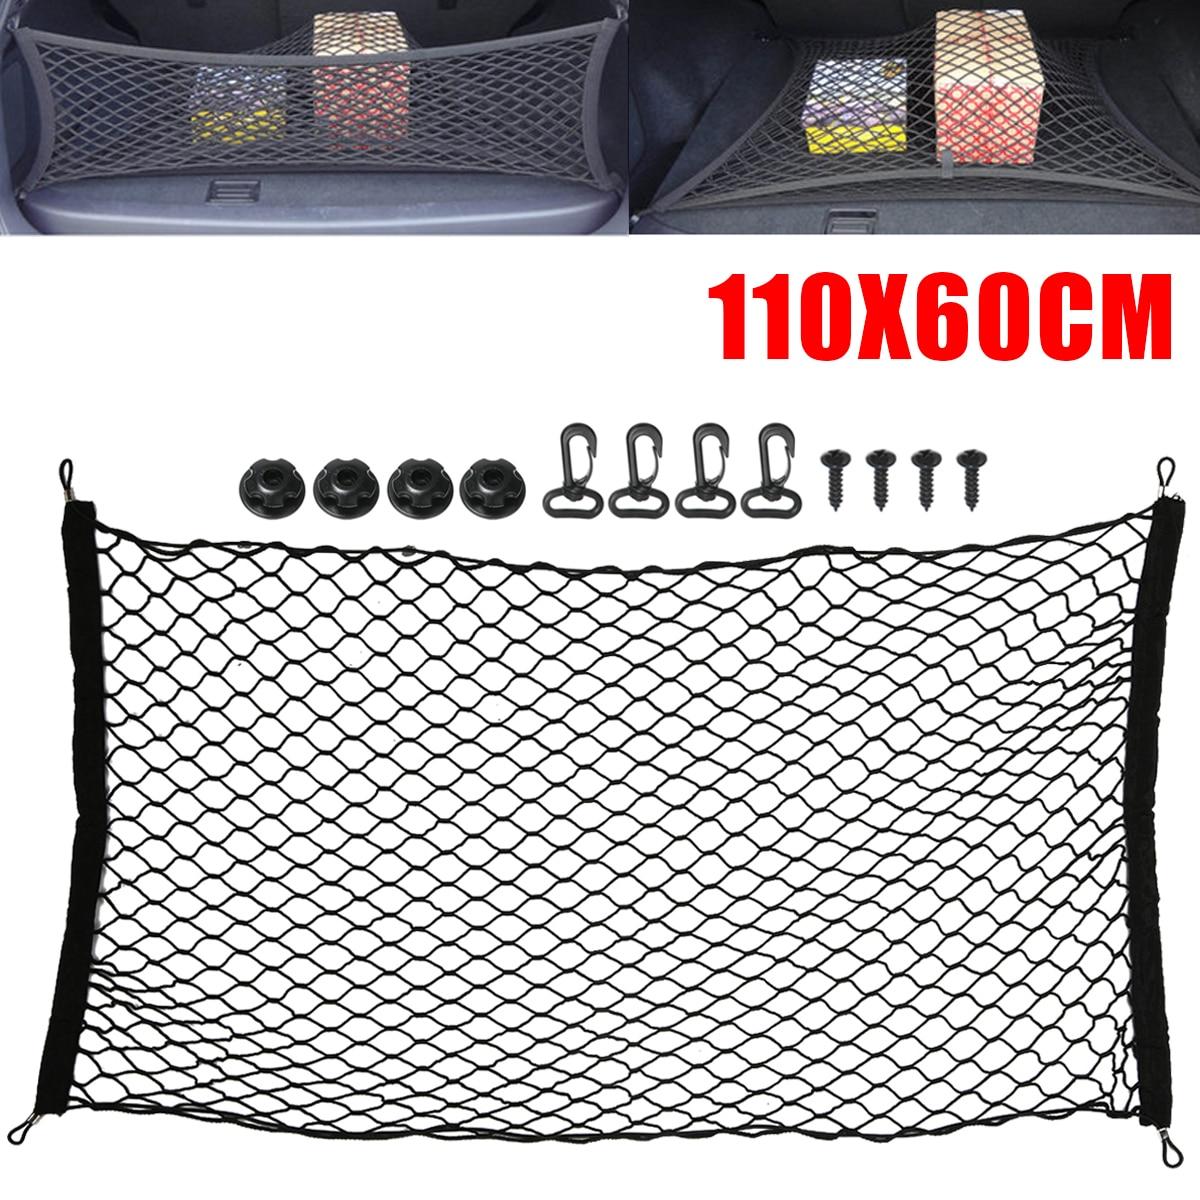 Car Interior Nets 1pc 110x60cm Car Cargo Net Nylon Elastic Mesh Luggage Storage Mesh for Car SUV Pickup Truck